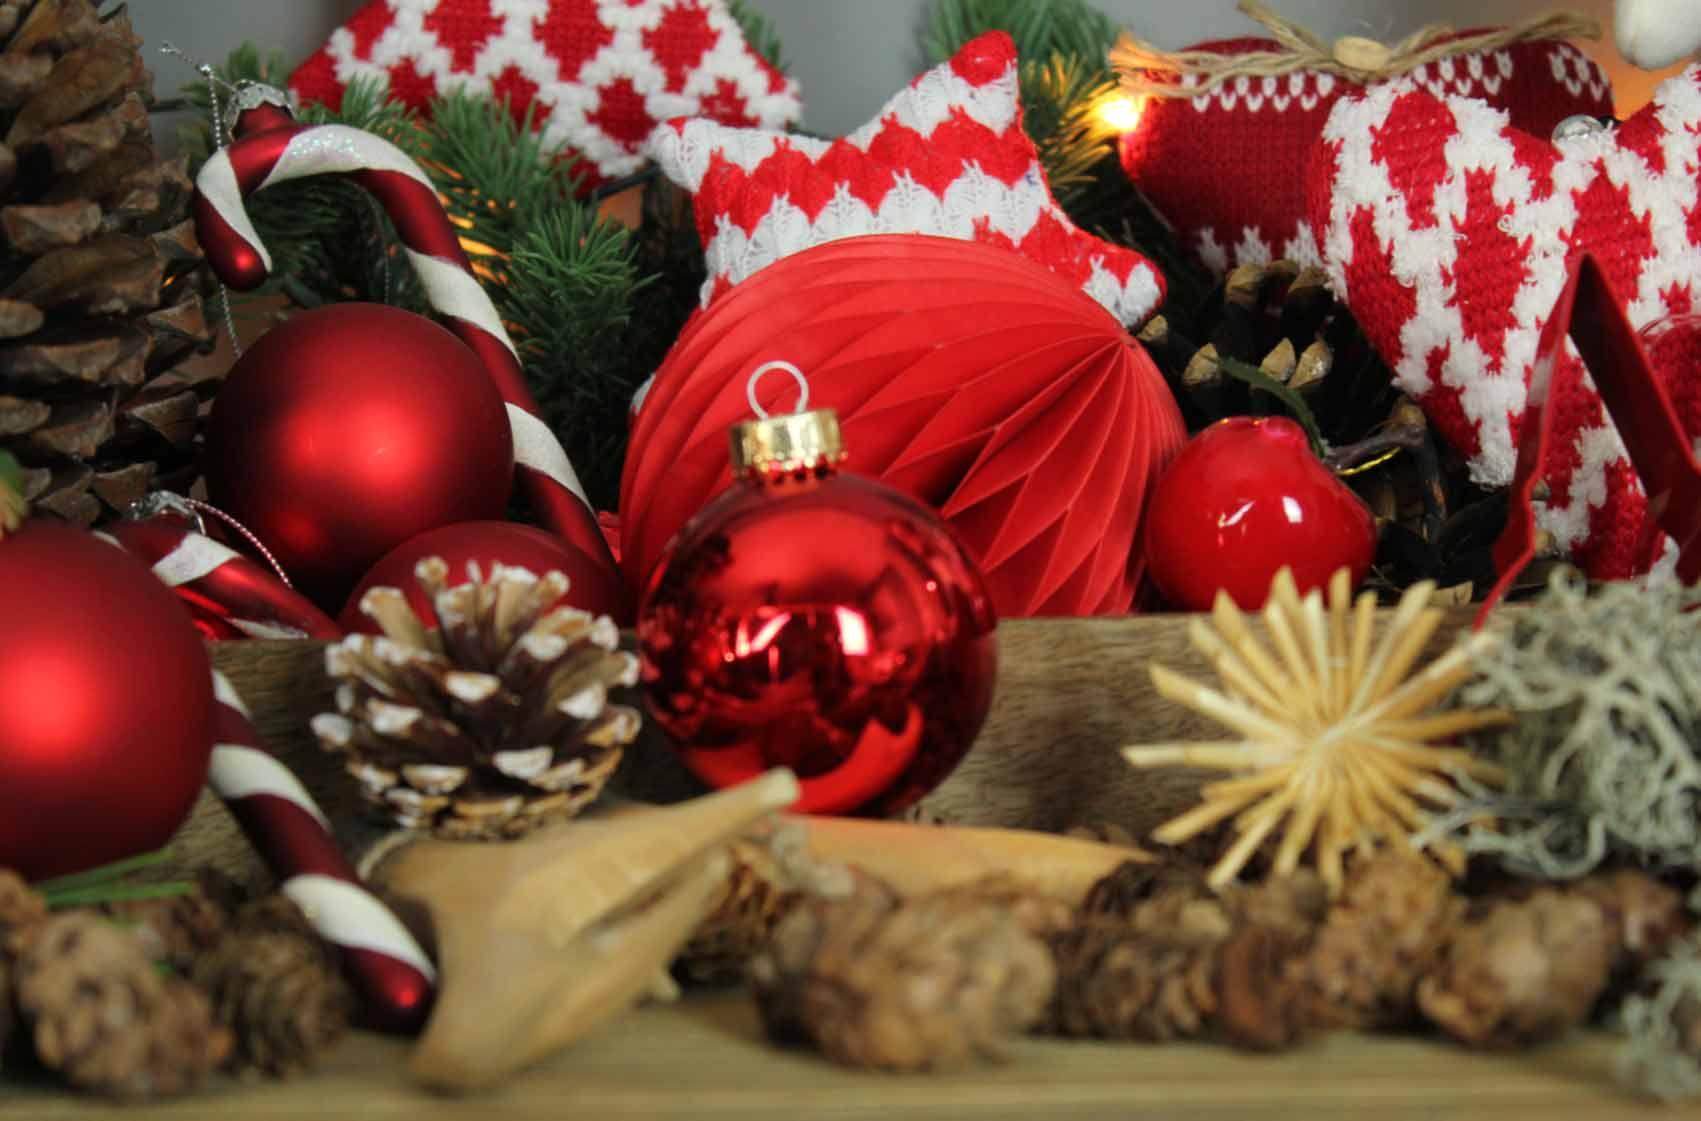 dekoration weihnachten mokowo lifetyleblog rot mokowo. Black Bedroom Furniture Sets. Home Design Ideas